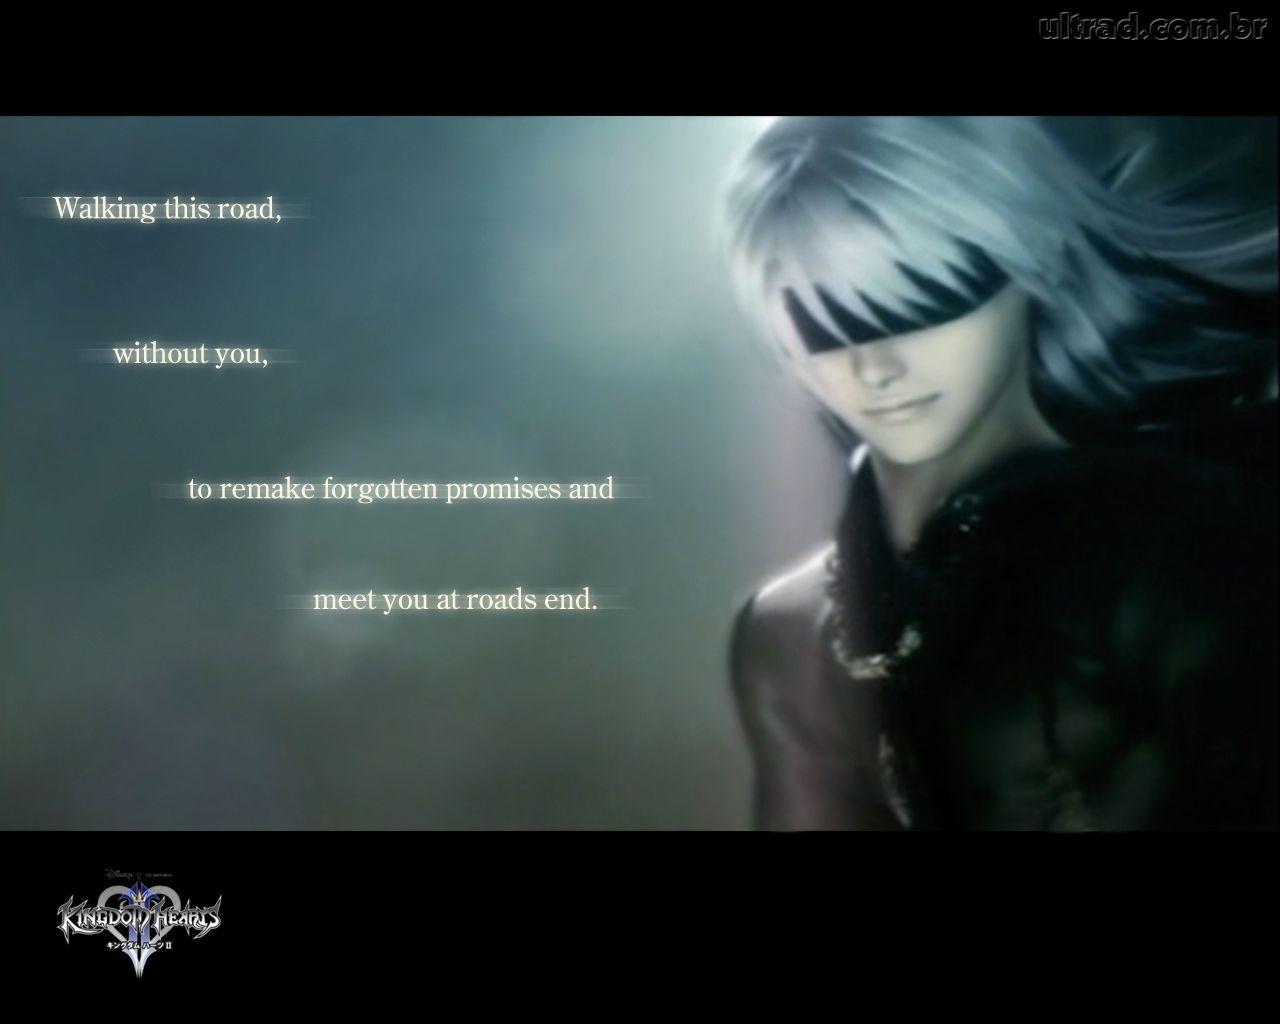 Kingdom Hearts Quotes Kingdom Hearts Riku Wallpaper Kingdom Hearts 2 Riku  3Kingdom